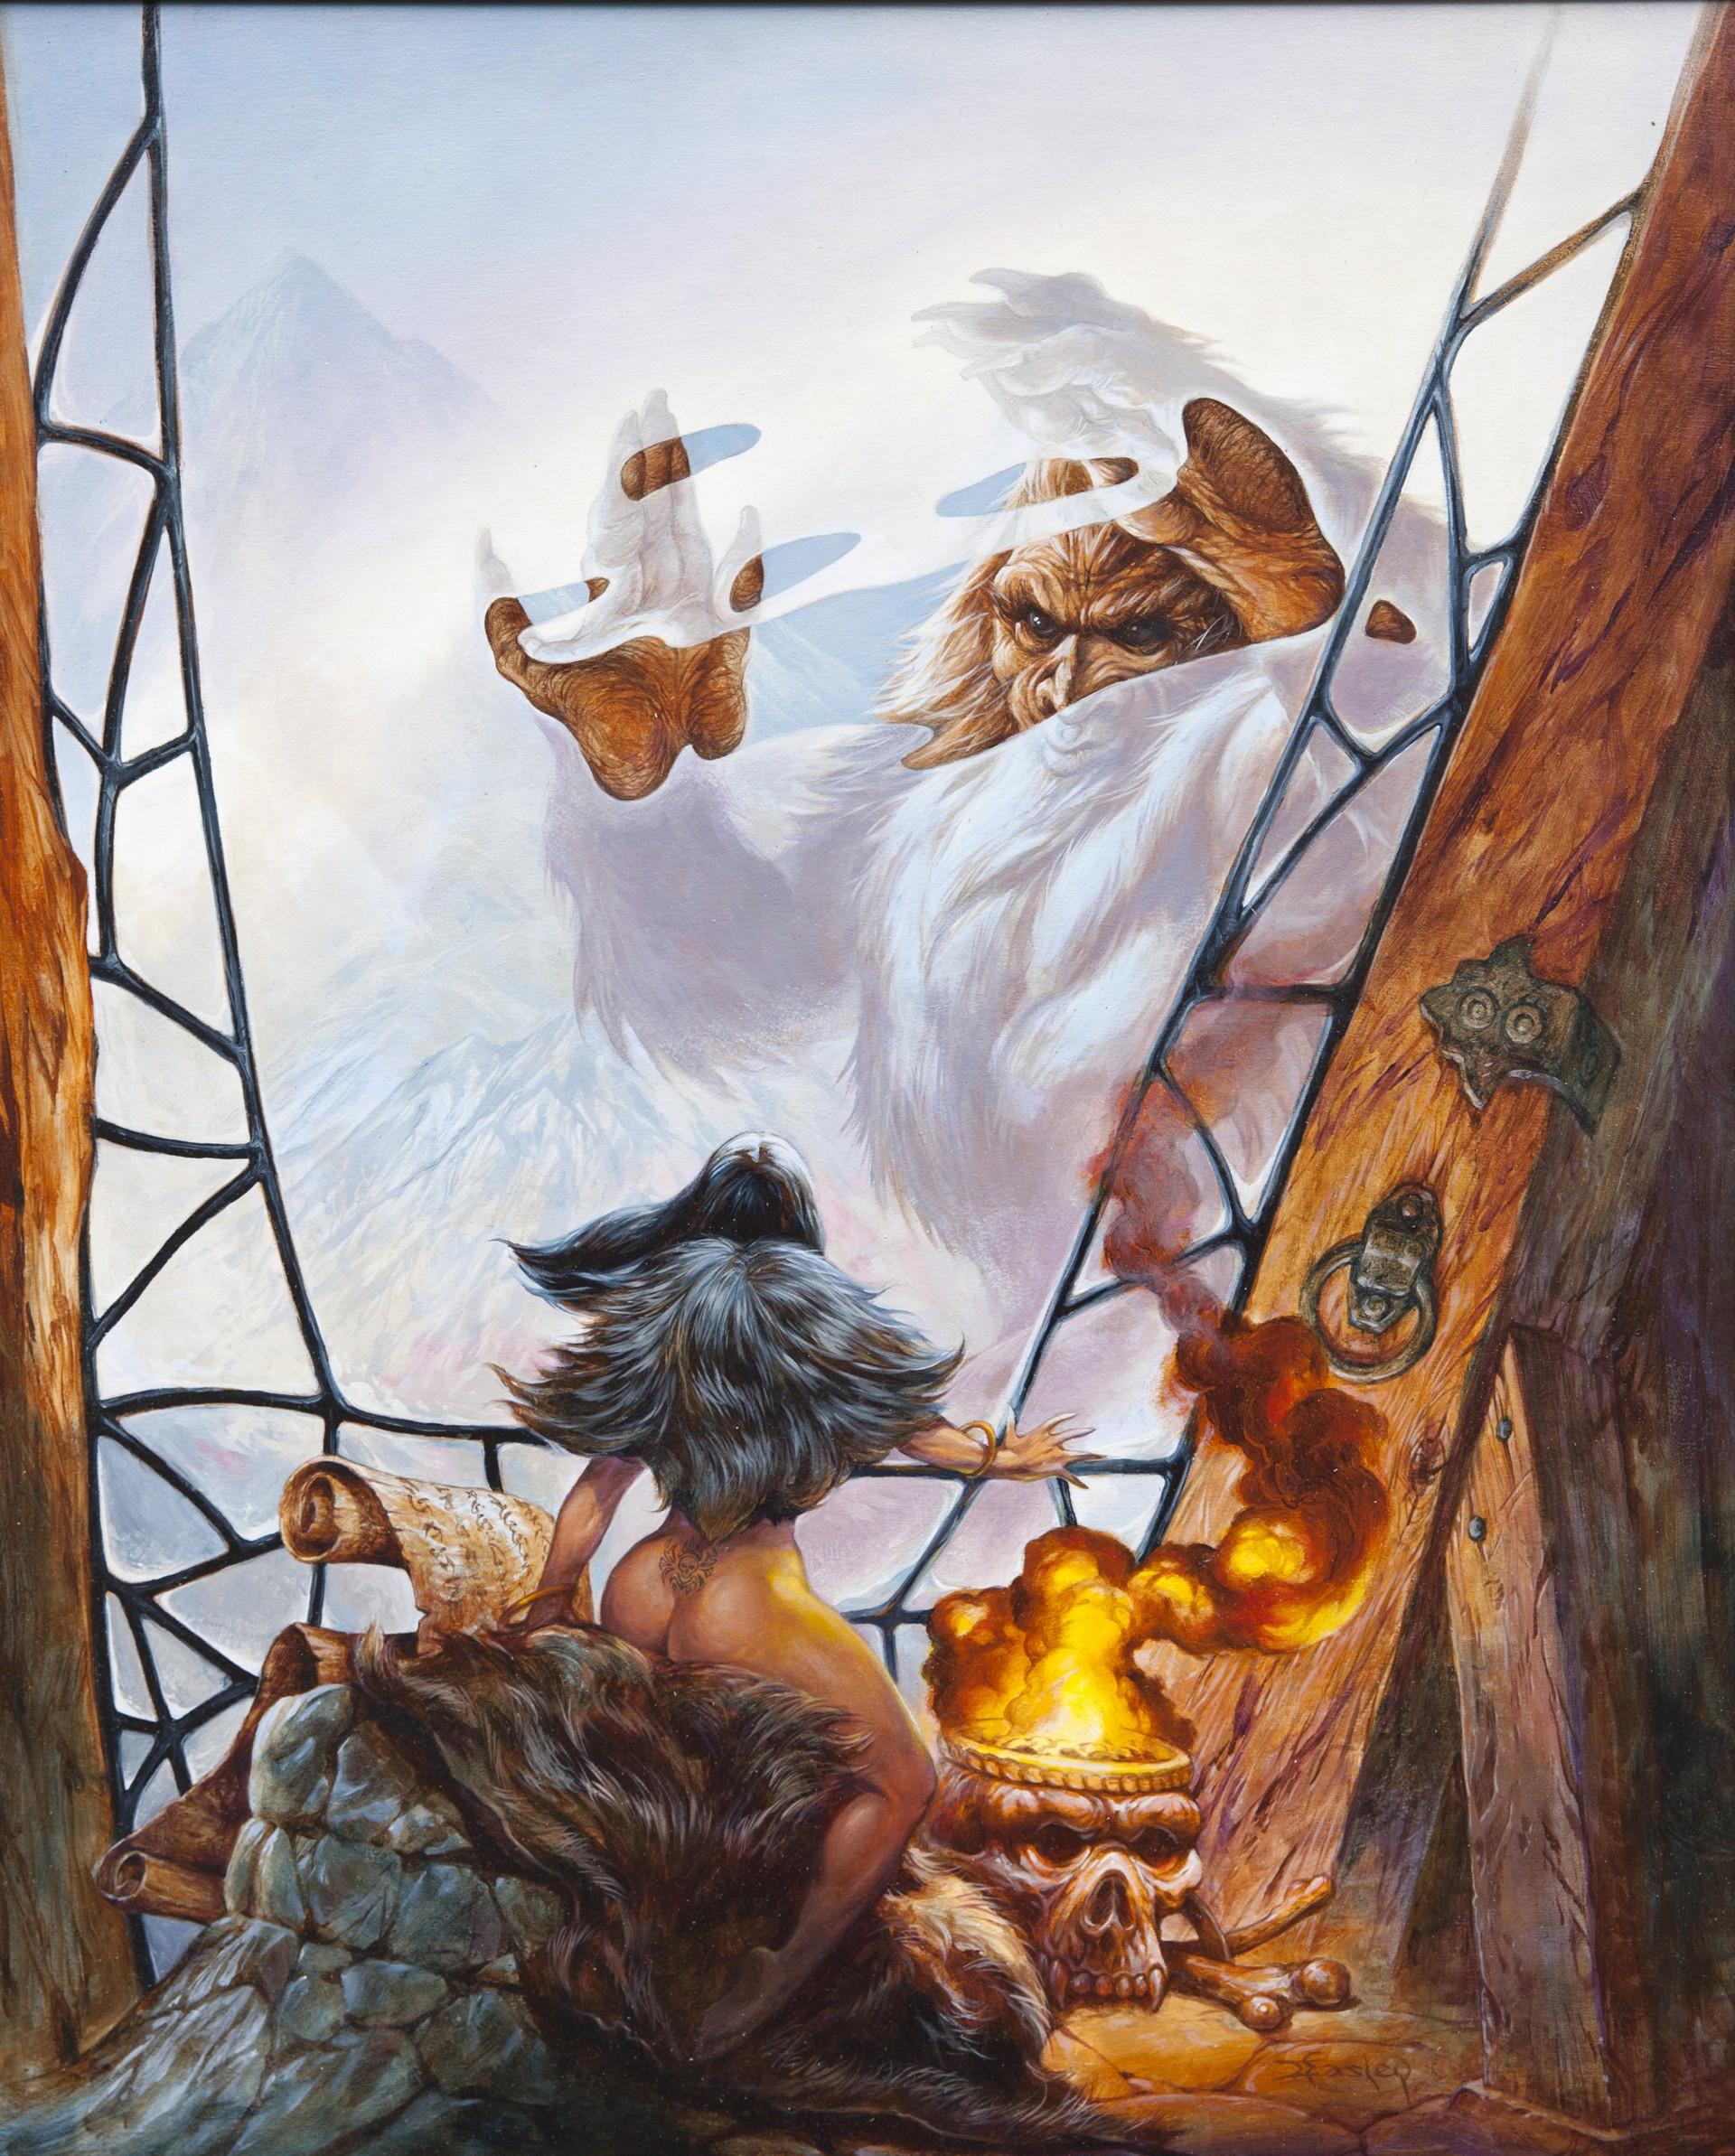 Yeti by Jeff Easley